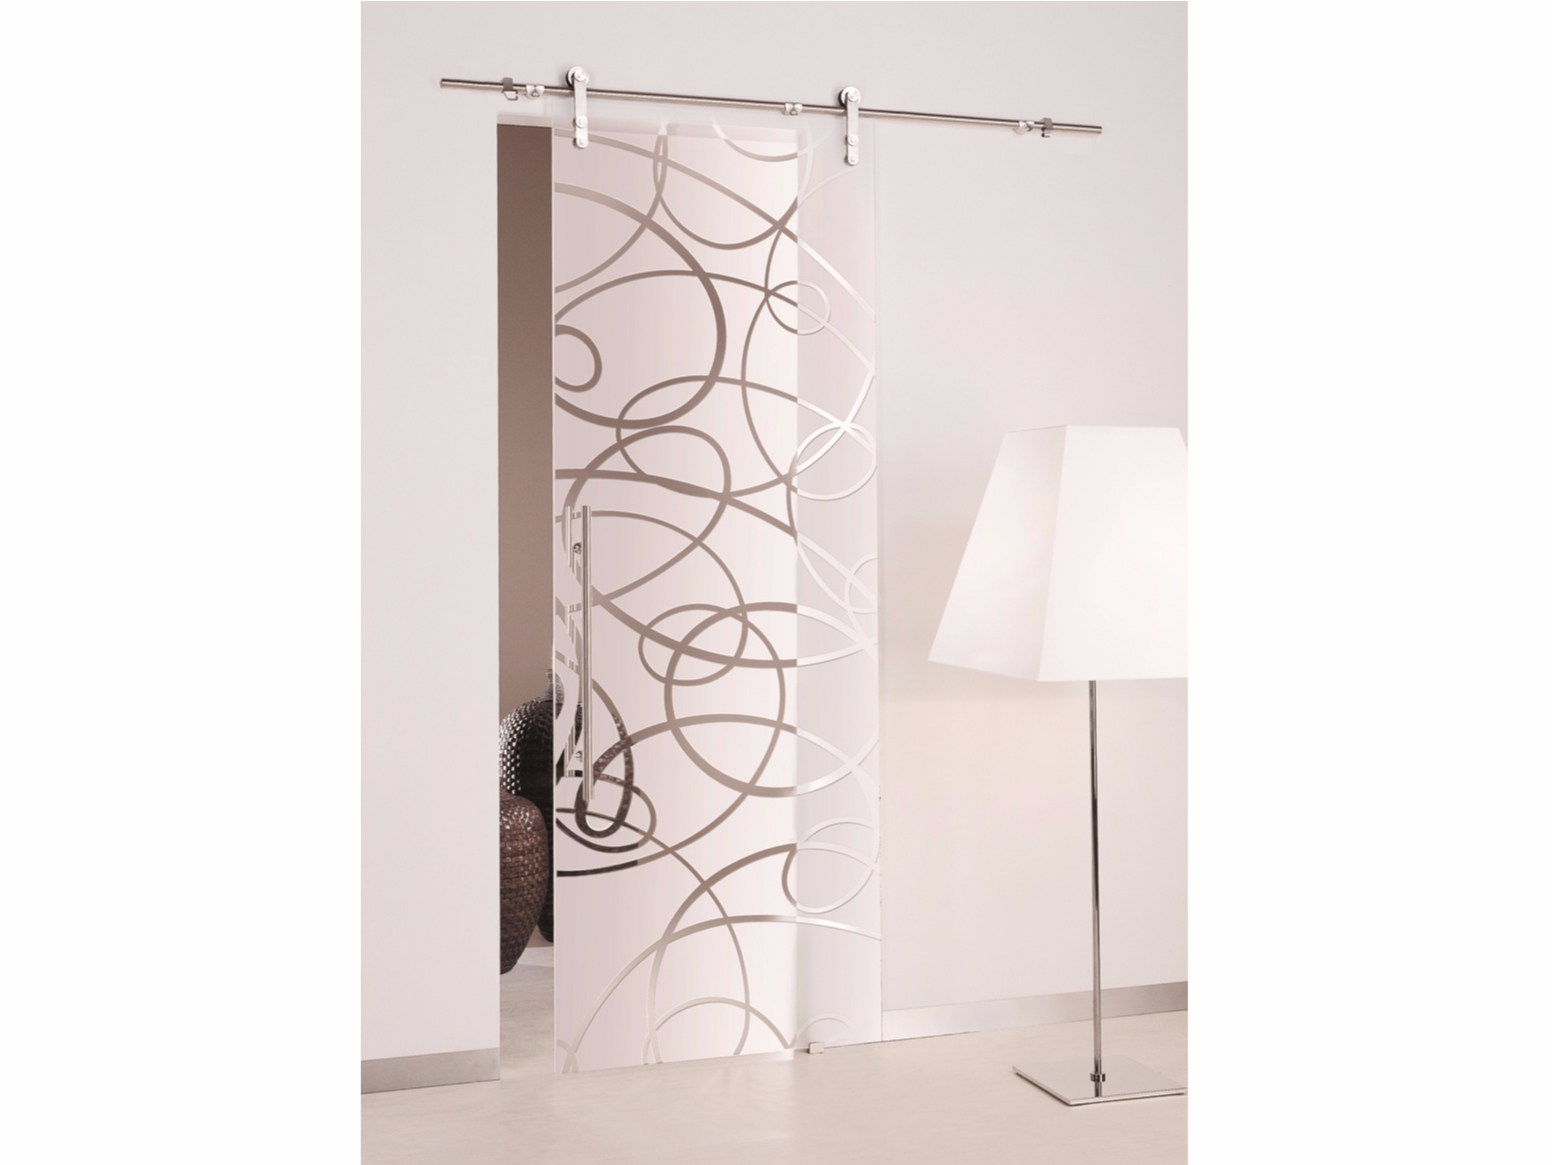 aura porte coulissante by casali. Black Bedroom Furniture Sets. Home Design Ideas